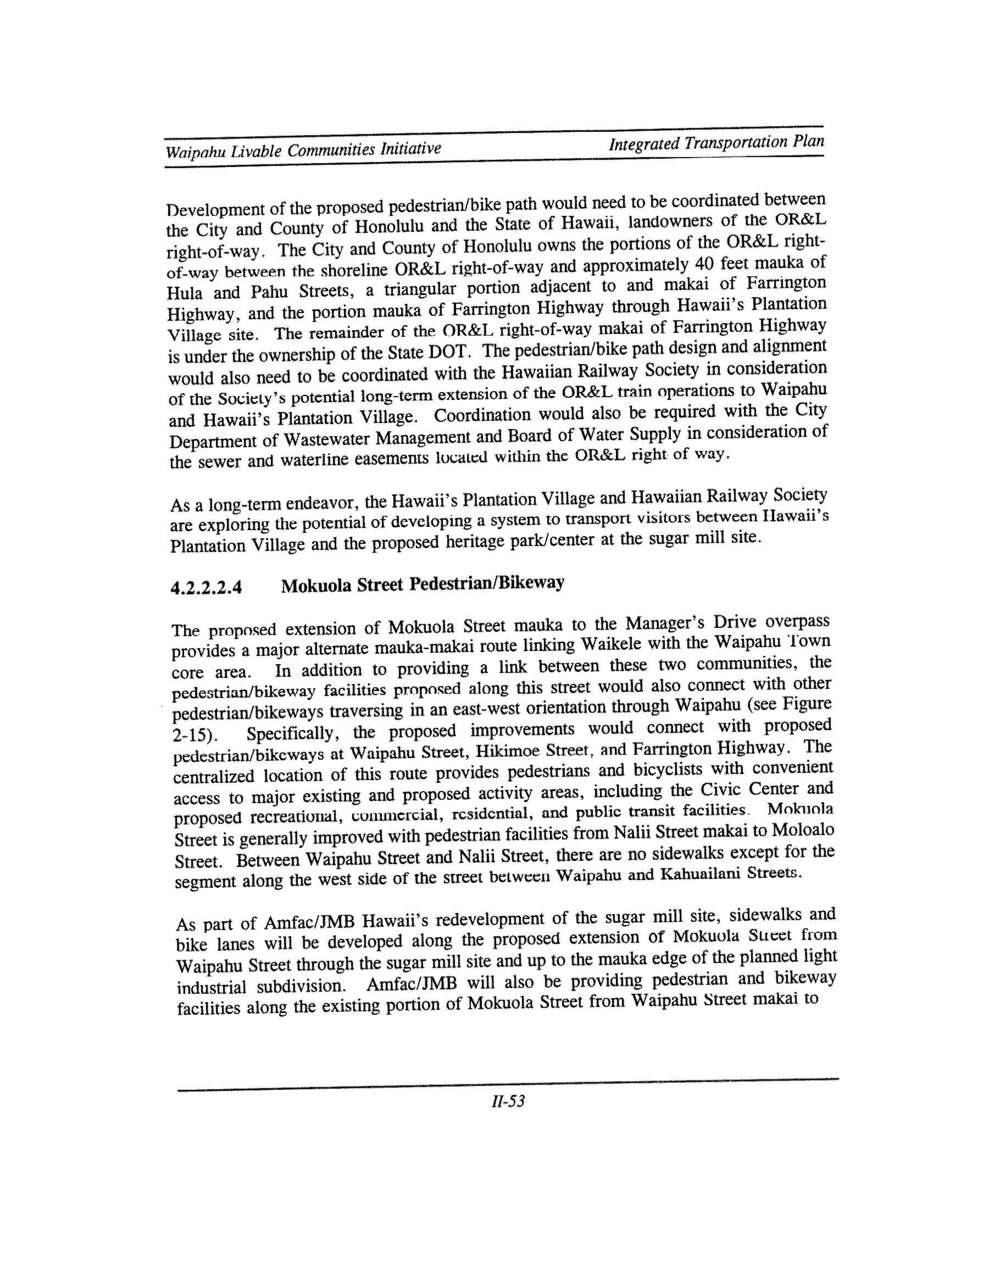 160531_WaipahuLivableCommunities(1998)_Page_068.jpg